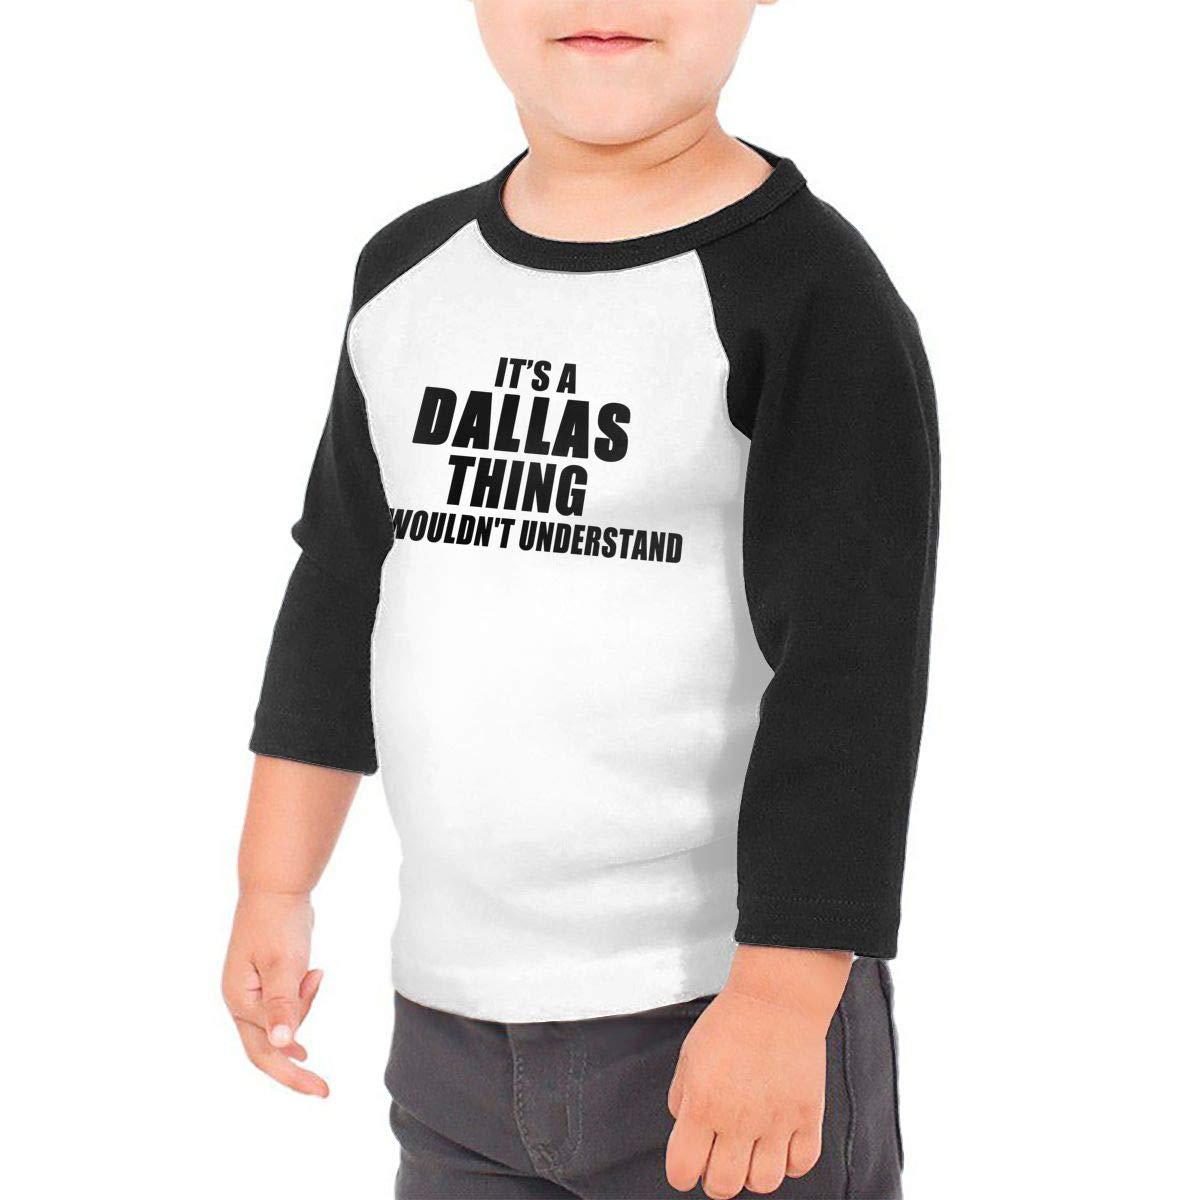 yimo Cute Cartoon Bule Whale Unisex Toddler Baseball Jersey Contrast 3//4 Sleeves Tee